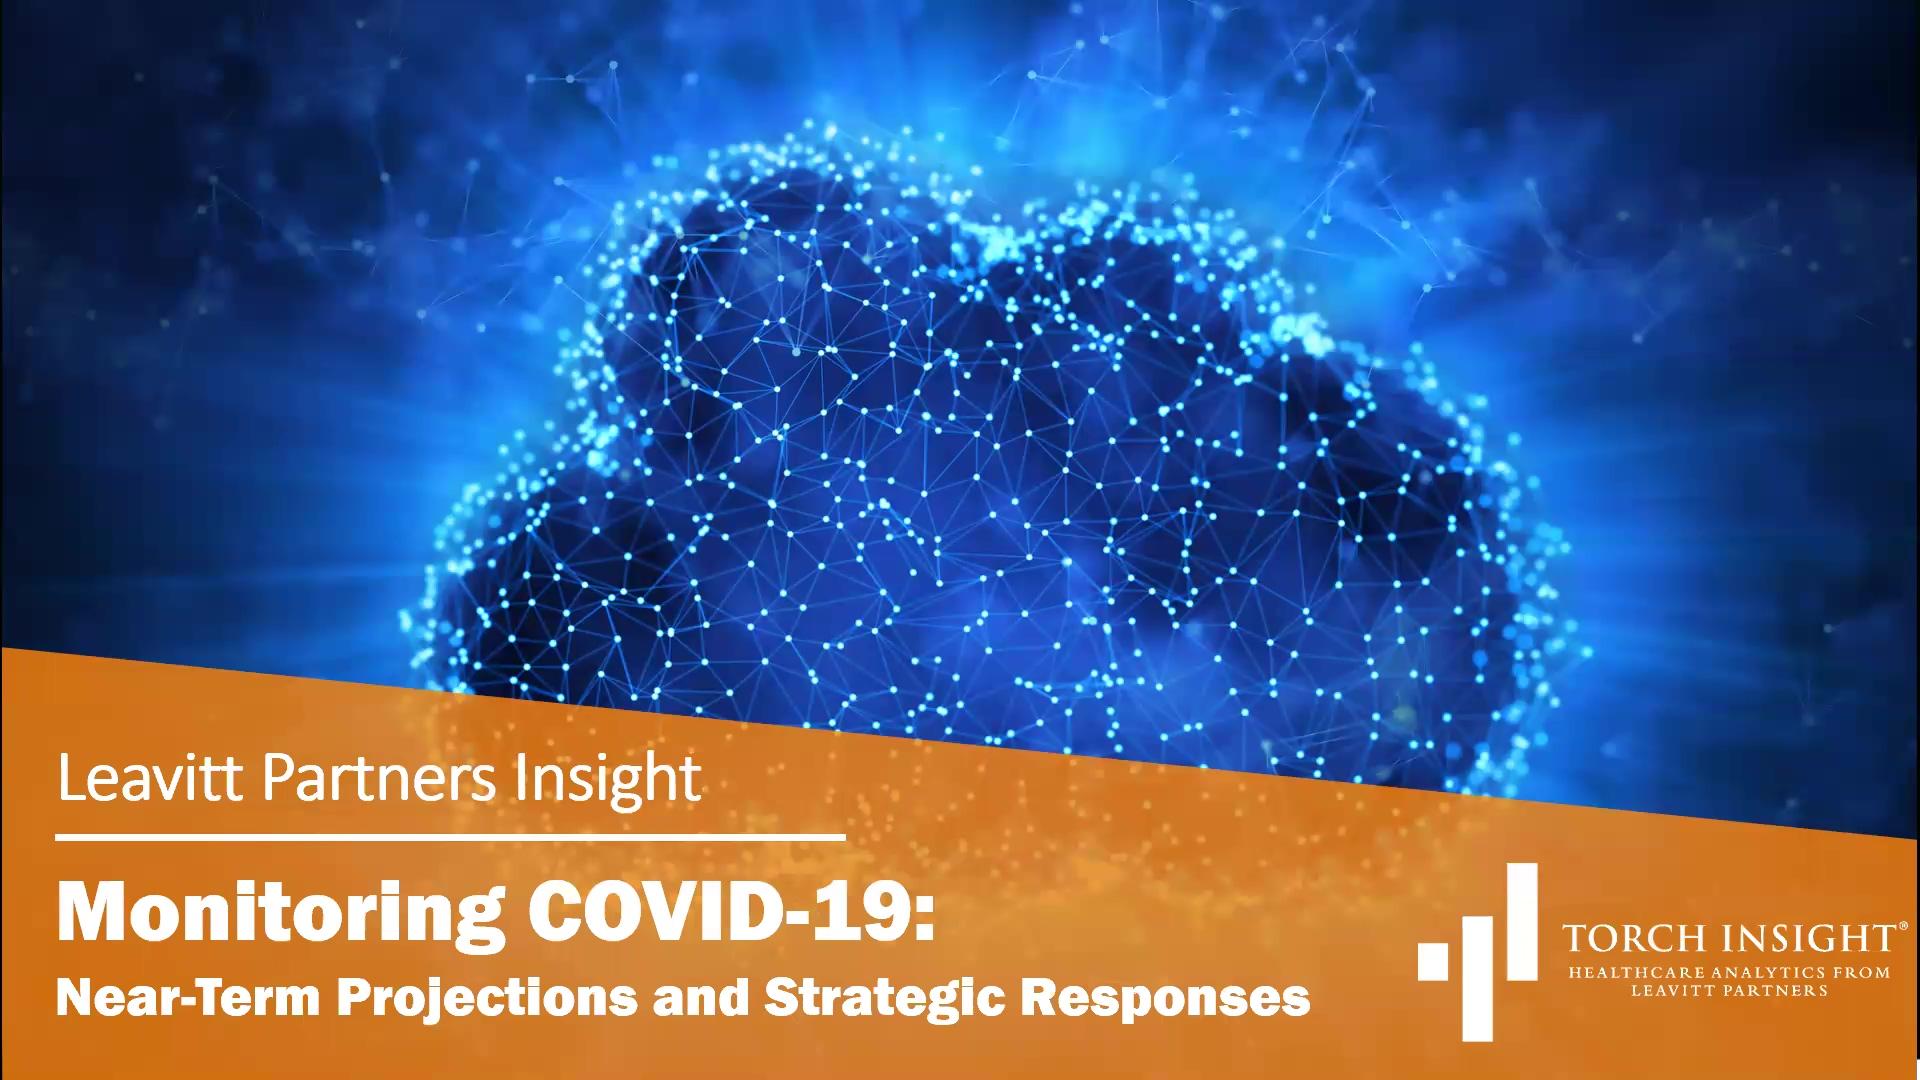 5.20.20 LPI Webinar Recording - Monitoring COVID-19